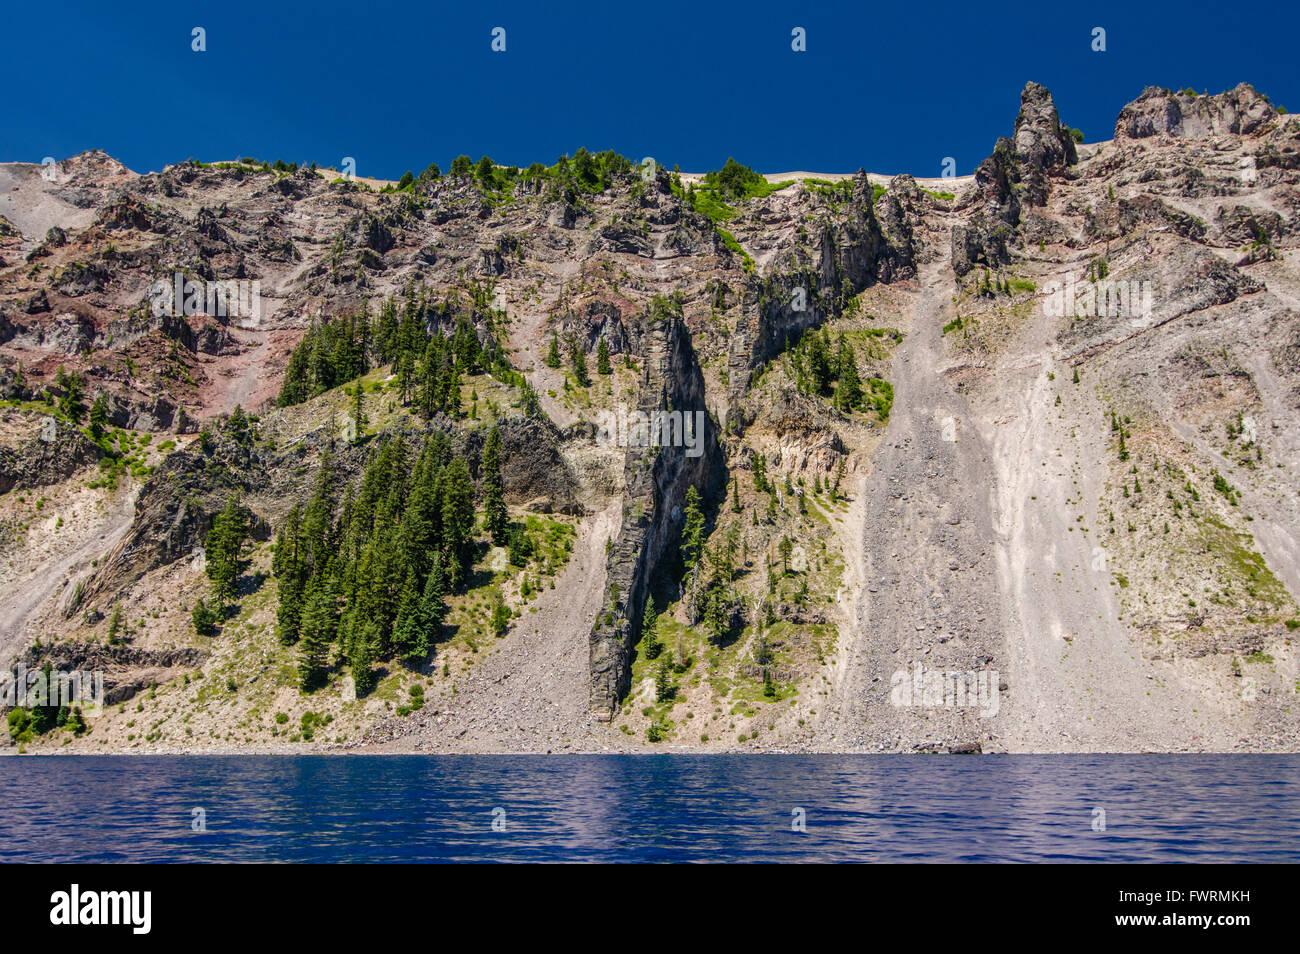 Devil's Backbone volcanic upthrust in the crater rim.  Crater Lake National Park, Oregon - Stock Image